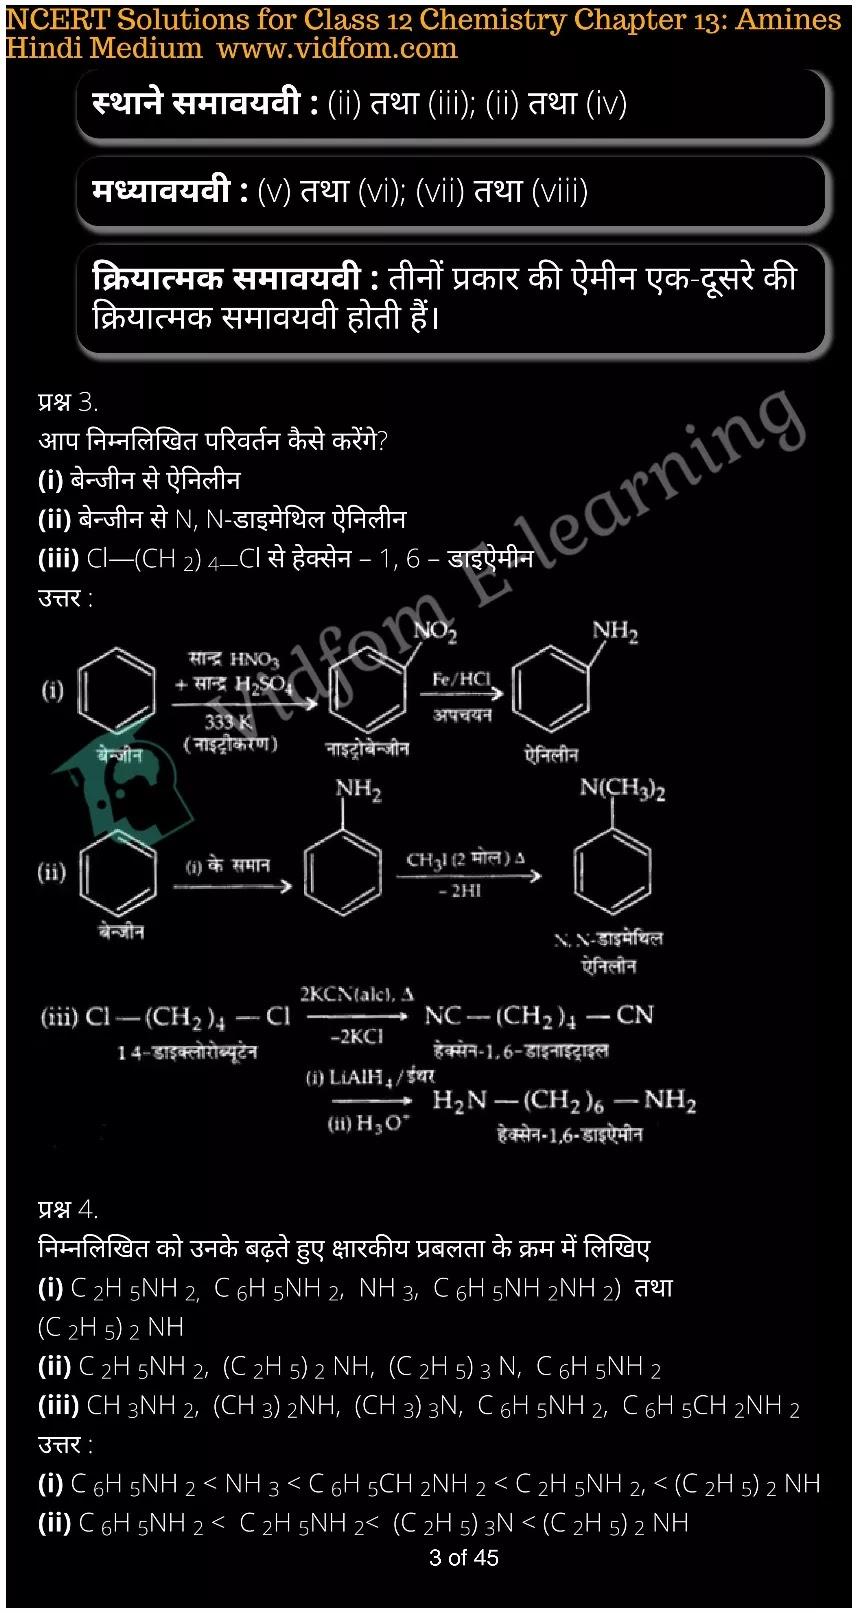 कक्षा 12 रसायन विज्ञान  के नोट्स  हिंदी में एनसीईआरटी समाधान,     class 12 Chemistry Chapter 13,   class 12 Chemistry Chapter 13 ncert solutions in Hindi,   class 12 Chemistry Chapter 13 notes in hindi,   class 12 Chemistry Chapter 13 question answer,   class 12 Chemistry Chapter 13 notes,   class 12 Chemistry Chapter 13 class 12 Chemistry Chapter 13 in  hindi,    class 12 Chemistry Chapter 13 important questions in  hindi,   class 12 Chemistry Chapter 13 notes in hindi,    class 12 Chemistry Chapter 13 test,   class 12 Chemistry Chapter 13 pdf,   class 12 Chemistry Chapter 13 notes pdf,   class 12 Chemistry Chapter 13 exercise solutions,   class 12 Chemistry Chapter 13 notes study rankers,   class 12 Chemistry Chapter 13 notes,    class 12 Chemistry Chapter 13  class 12  notes pdf,   class 12 Chemistry Chapter 13 class 12  notes  ncert,   class 12 Chemistry Chapter 13 class 12 pdf,   class 12 Chemistry Chapter 13  book,   class 12 Chemistry Chapter 13 quiz class 12  ,    10  th class 12 Chemistry Chapter 13  book up board,   up board 10  th class 12 Chemistry Chapter 13 notes,  class 12 Chemistry,   class 12 Chemistry ncert solutions in Hindi,   class 12 Chemistry notes in hindi,   class 12 Chemistry question answer,   class 12 Chemistry notes,  class 12 Chemistry class 12 Chemistry Chapter 13 in  hindi,    class 12 Chemistry important questions in  hindi,   class 12 Chemistry notes in hindi,    class 12 Chemistry test,  class 12 Chemistry class 12 Chemistry Chapter 13 pdf,   class 12 Chemistry notes pdf,   class 12 Chemistry exercise solutions,   class 12 Chemistry,  class 12 Chemistry notes study rankers,   class 12 Chemistry notes,  class 12 Chemistry notes,   class 12 Chemistry  class 12  notes pdf,   class 12 Chemistry class 12  notes  ncert,   class 12 Chemistry class 12 pdf,   class 12 Chemistry  book,  class 12 Chemistry quiz class 12  ,  10  th class 12 Chemistry    book up board,    up board 10  th class 12 Chemistry notes,      कक्षा 12 रसायन विज्ञान अध्